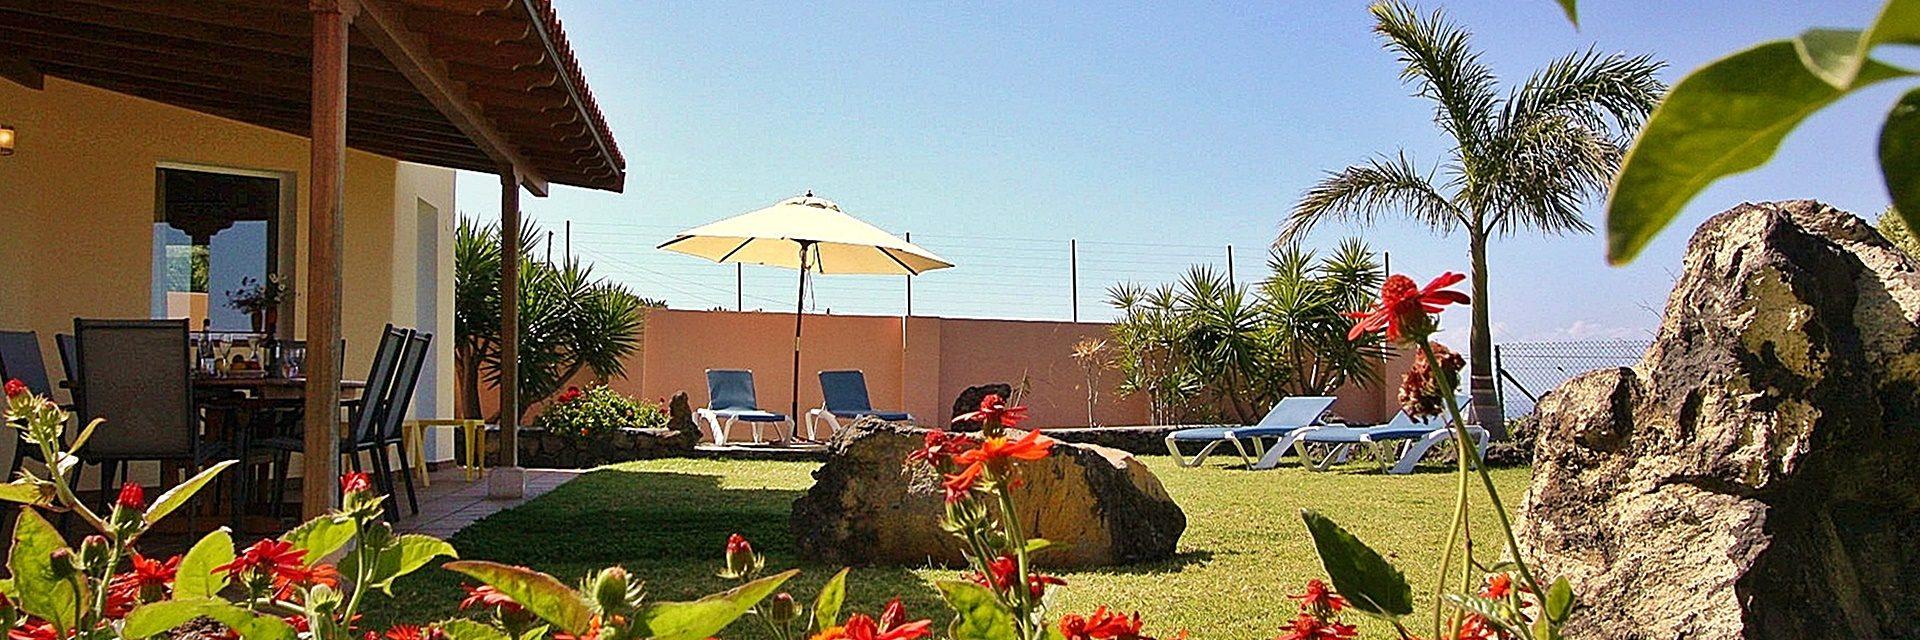 Ferienhaus Casa Soluna - La Palma - Kanarische Inseln